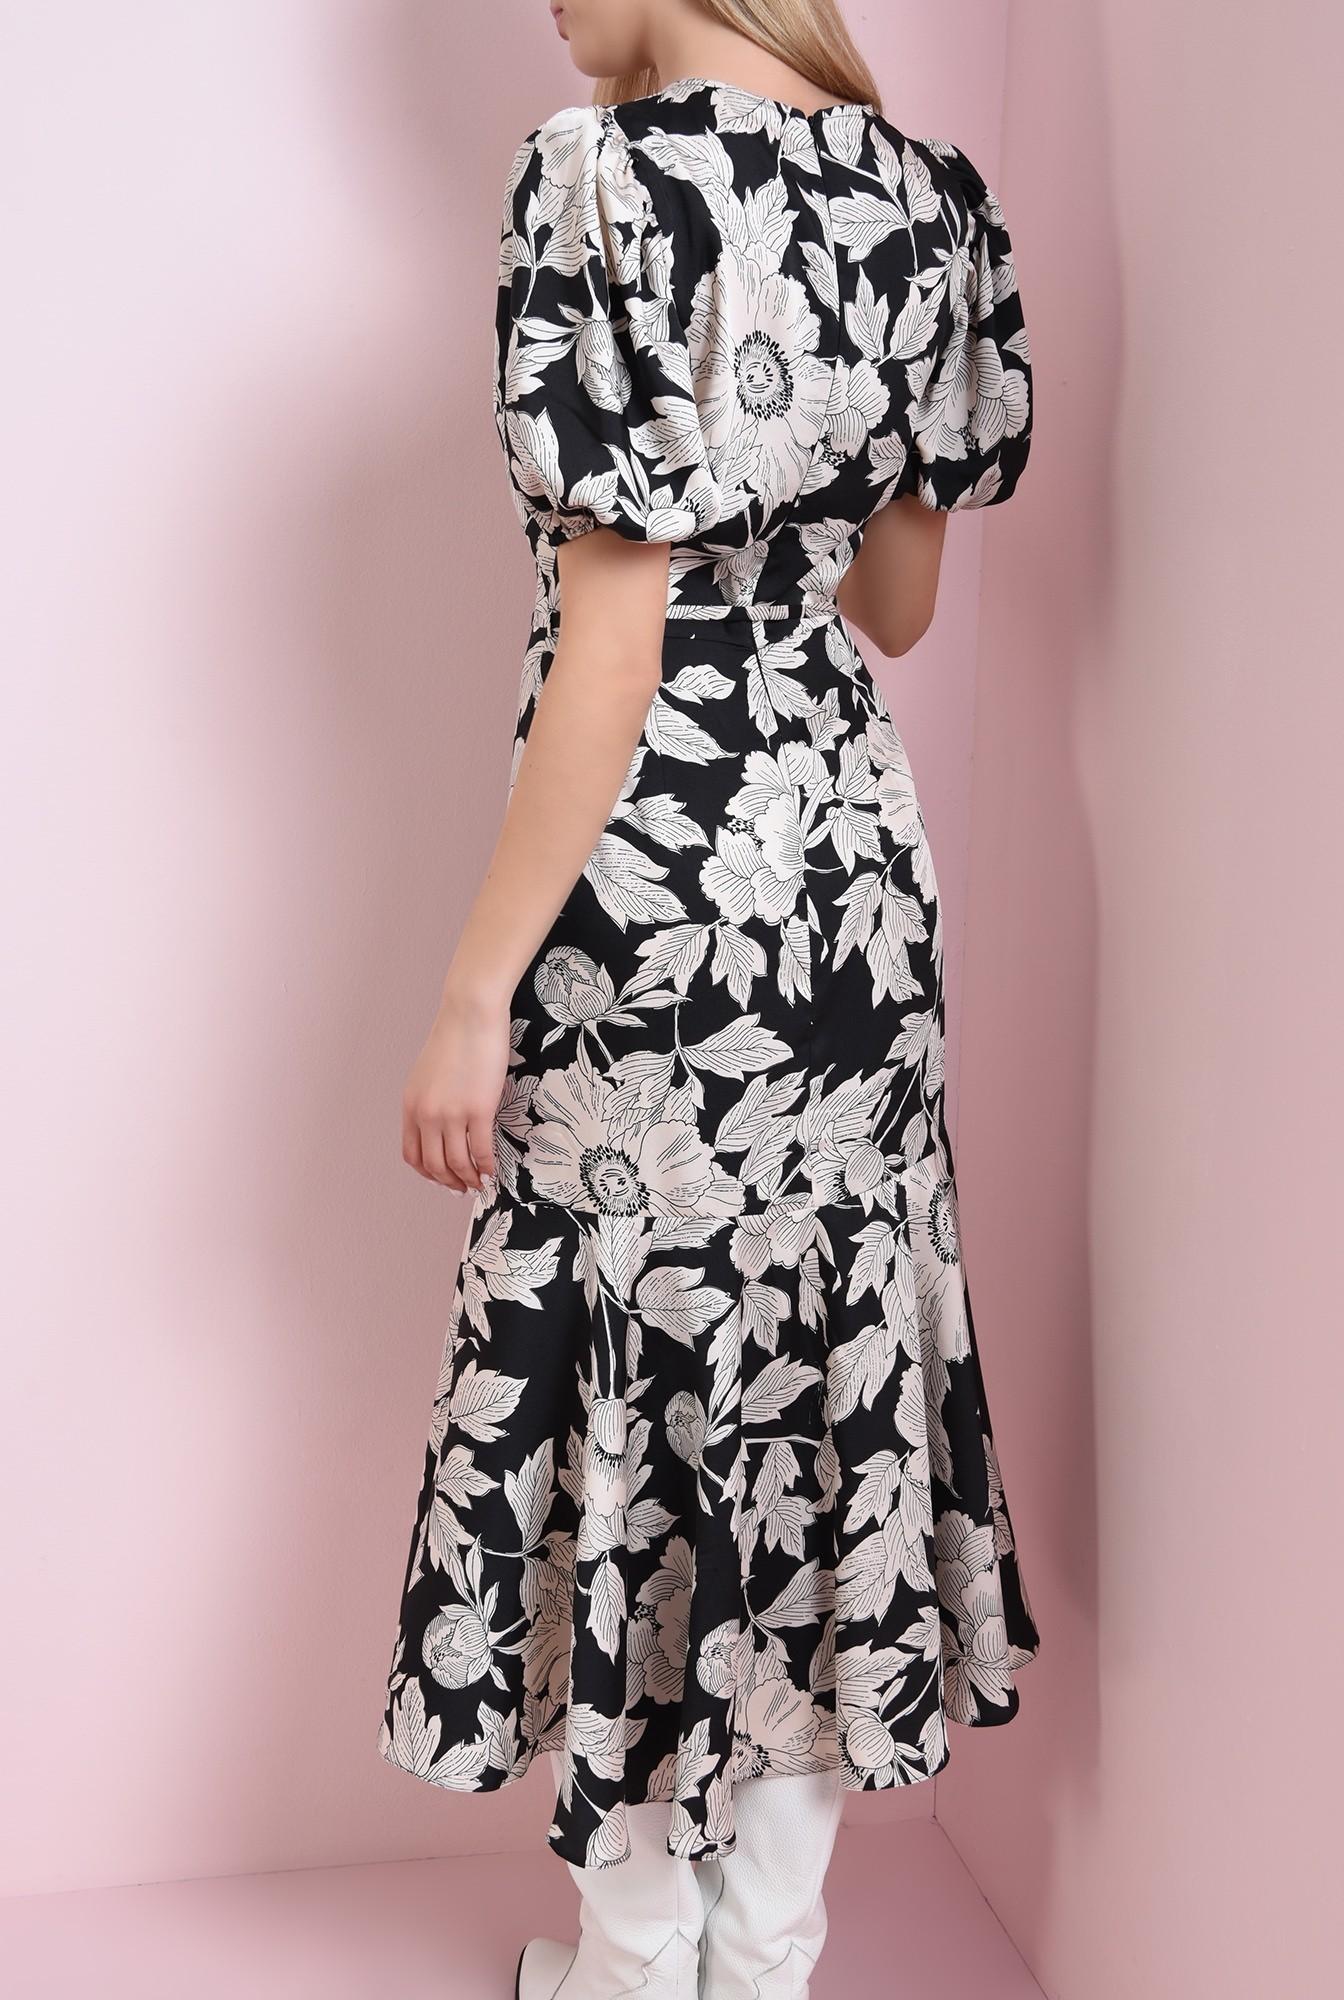 1 - 360 - rochie neagra, cu flori, Poema